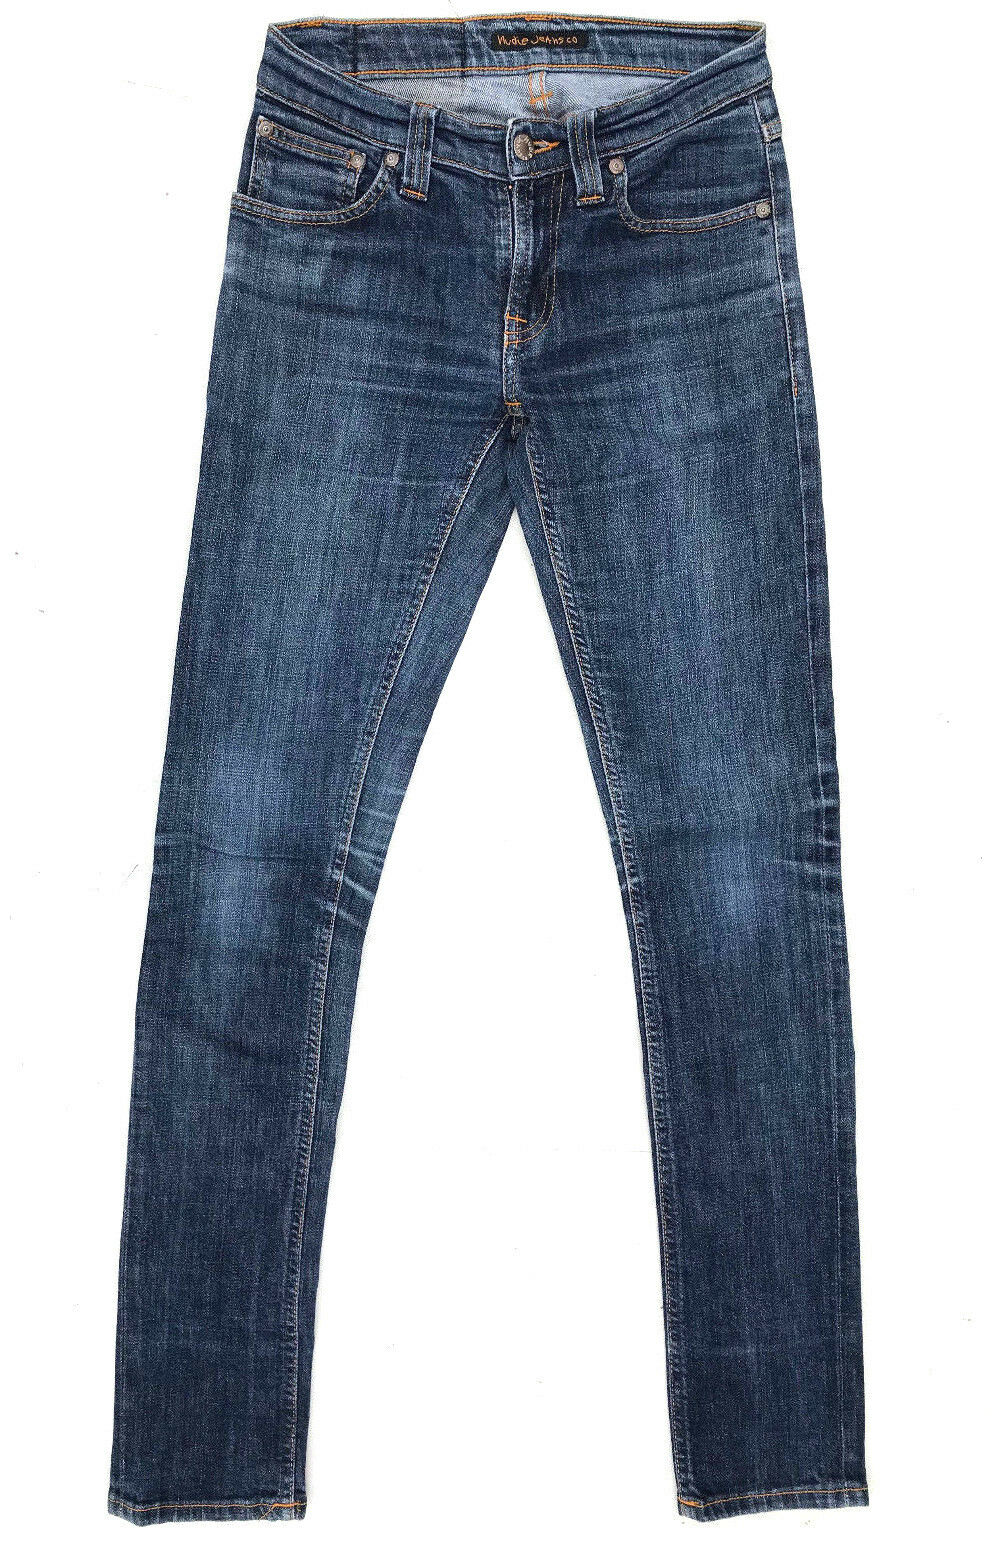 Nudie Jeans 'TIGHT LONG JOHN DENIM STRETCH' W25 L32 AU7 US3 RRP  Womens